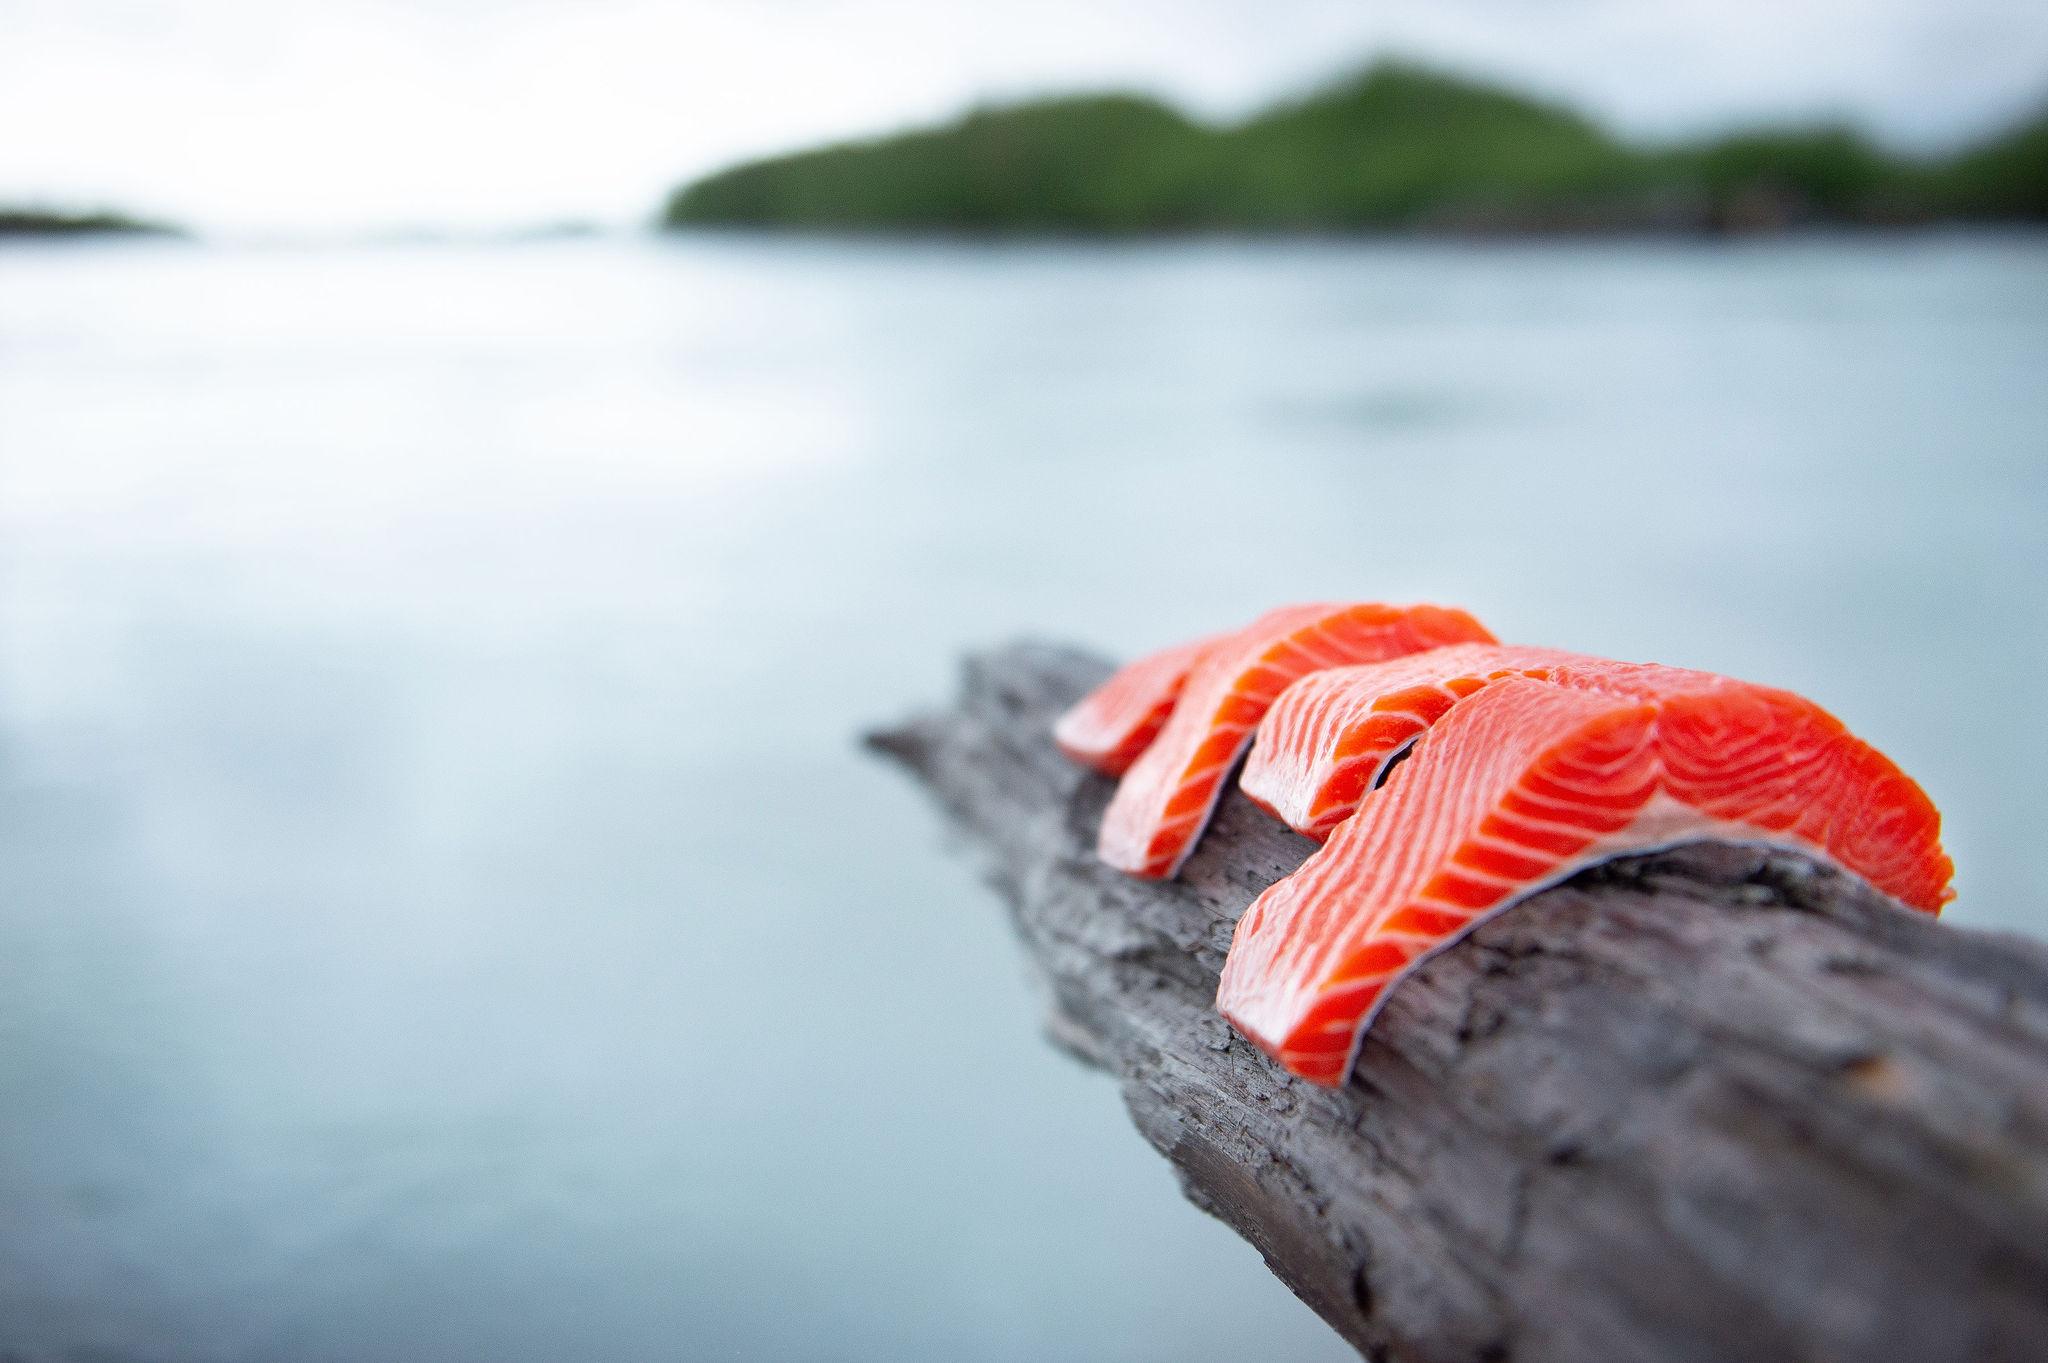 Sockeye salmon filets - buy sockeye salmon